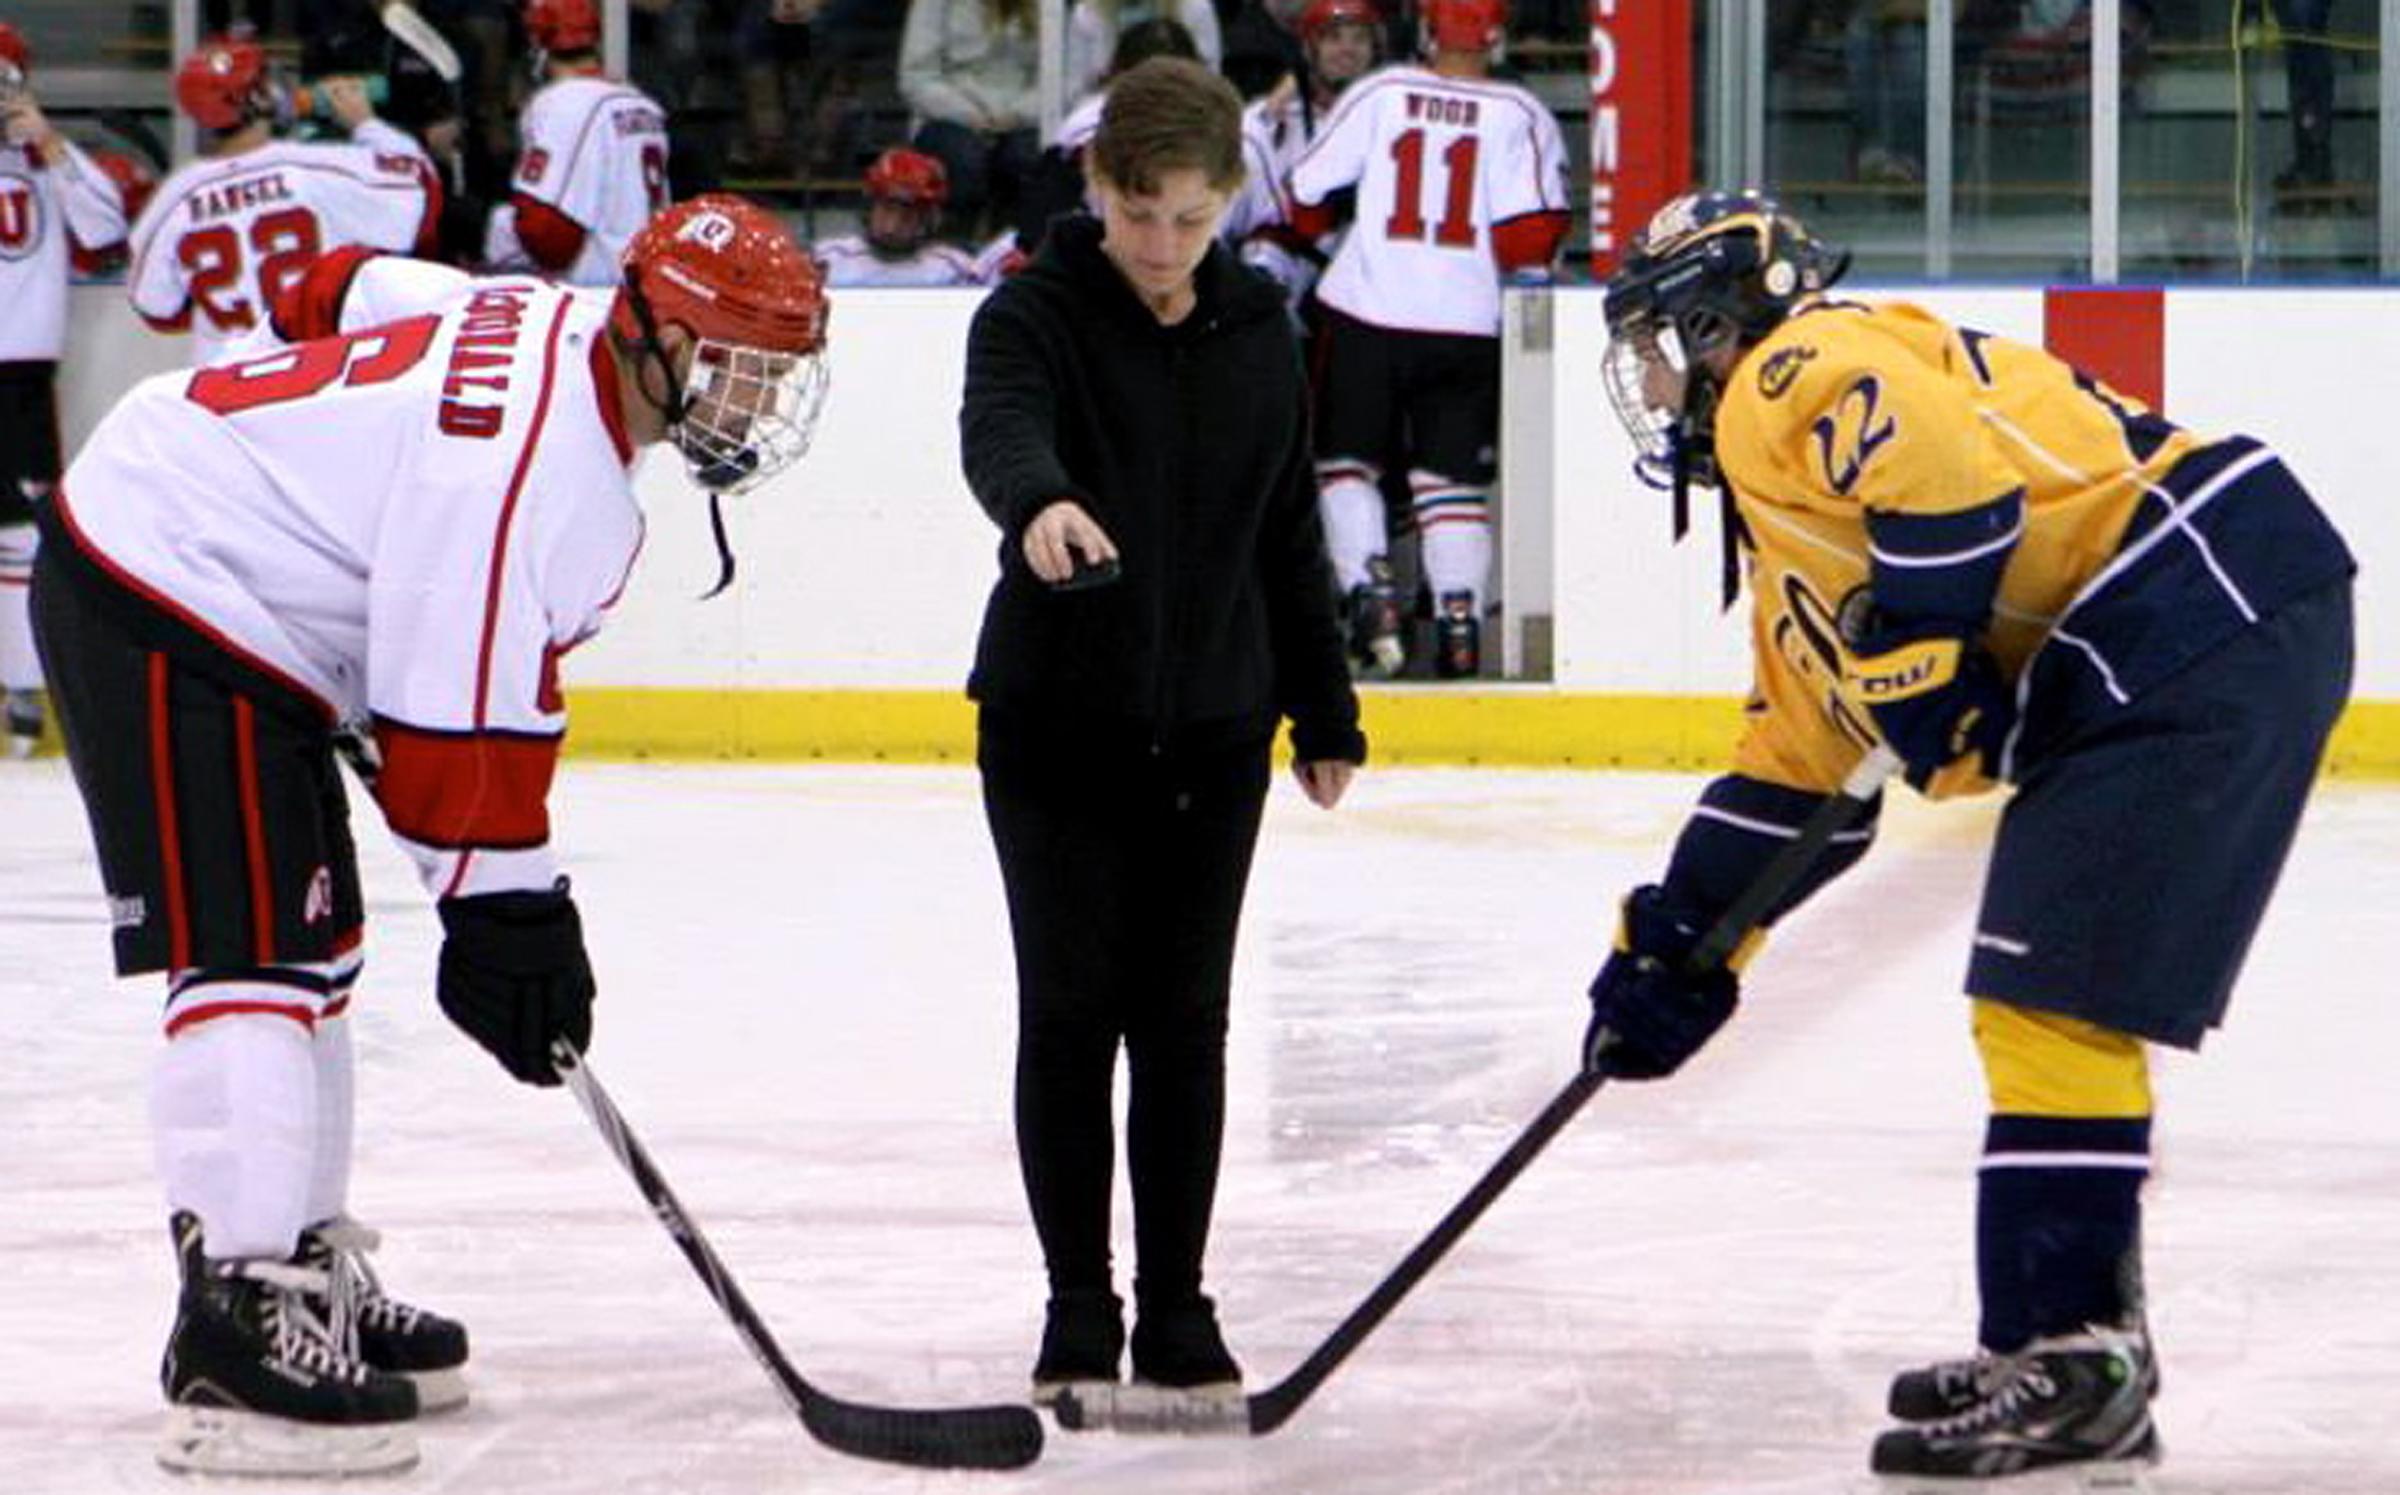 University of Utah student Annika Pecchia-Bekkum, a Gates Cambridge Scholar for 2014, shown receiving another honor--dropping the puck at a Utah vs. UC Berkeley hockey game.